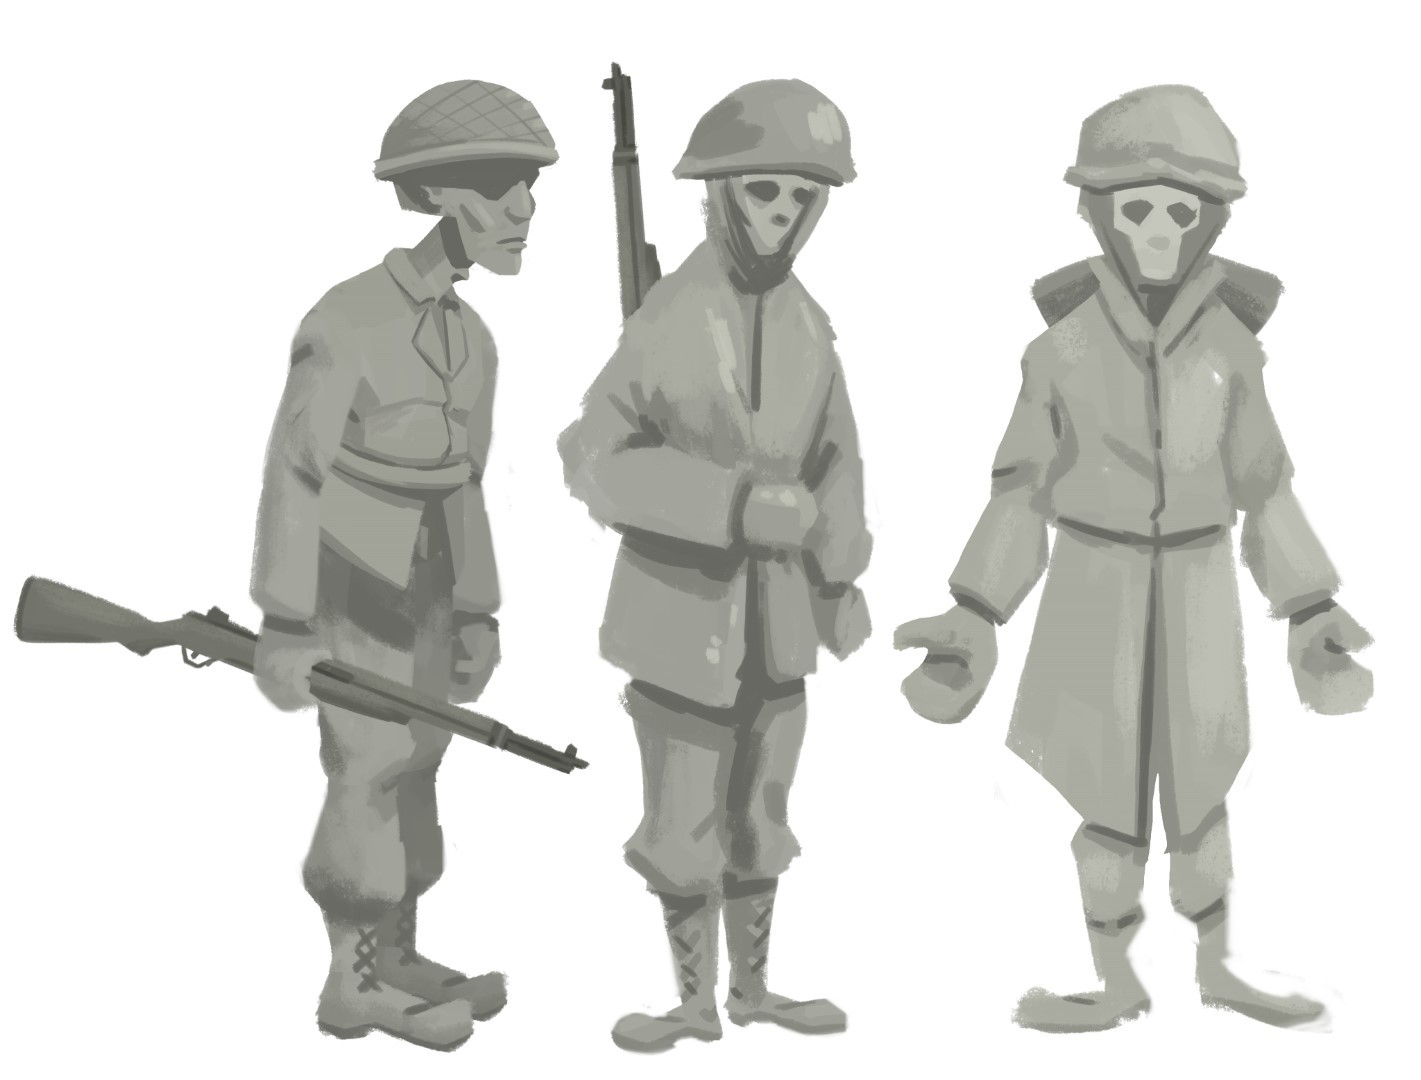 Ethan yazel imagebrew sketch soldiers 01 large